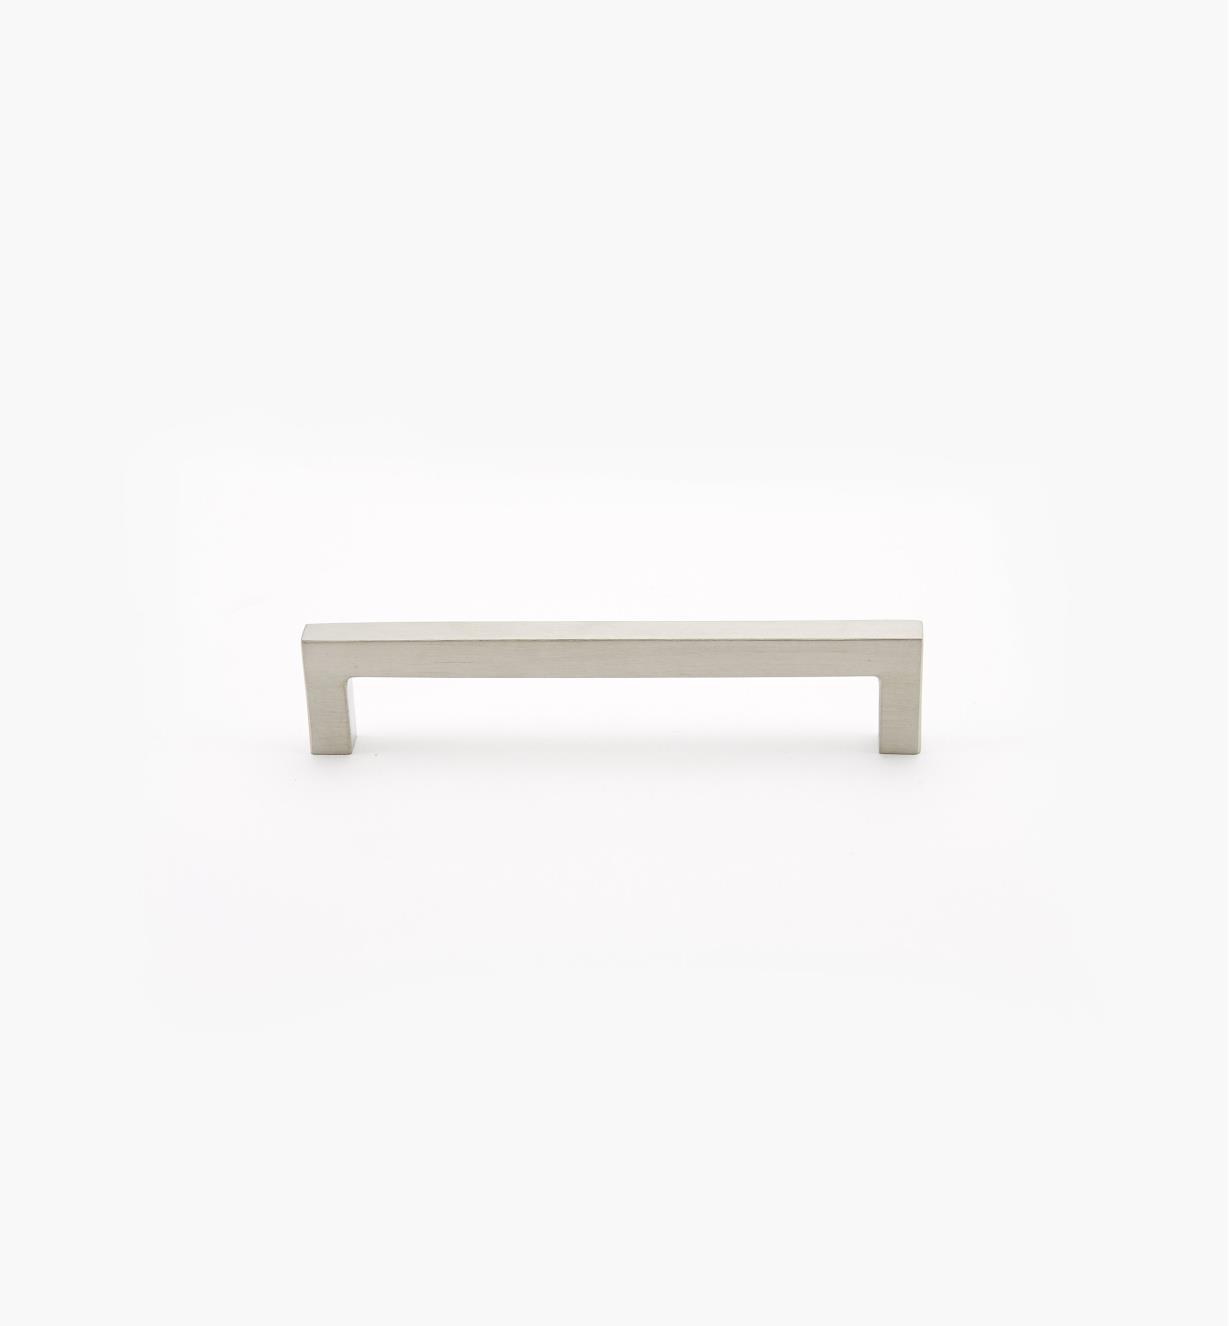 01W8412 - Poignée carrée en acier inoxydable, 128mm